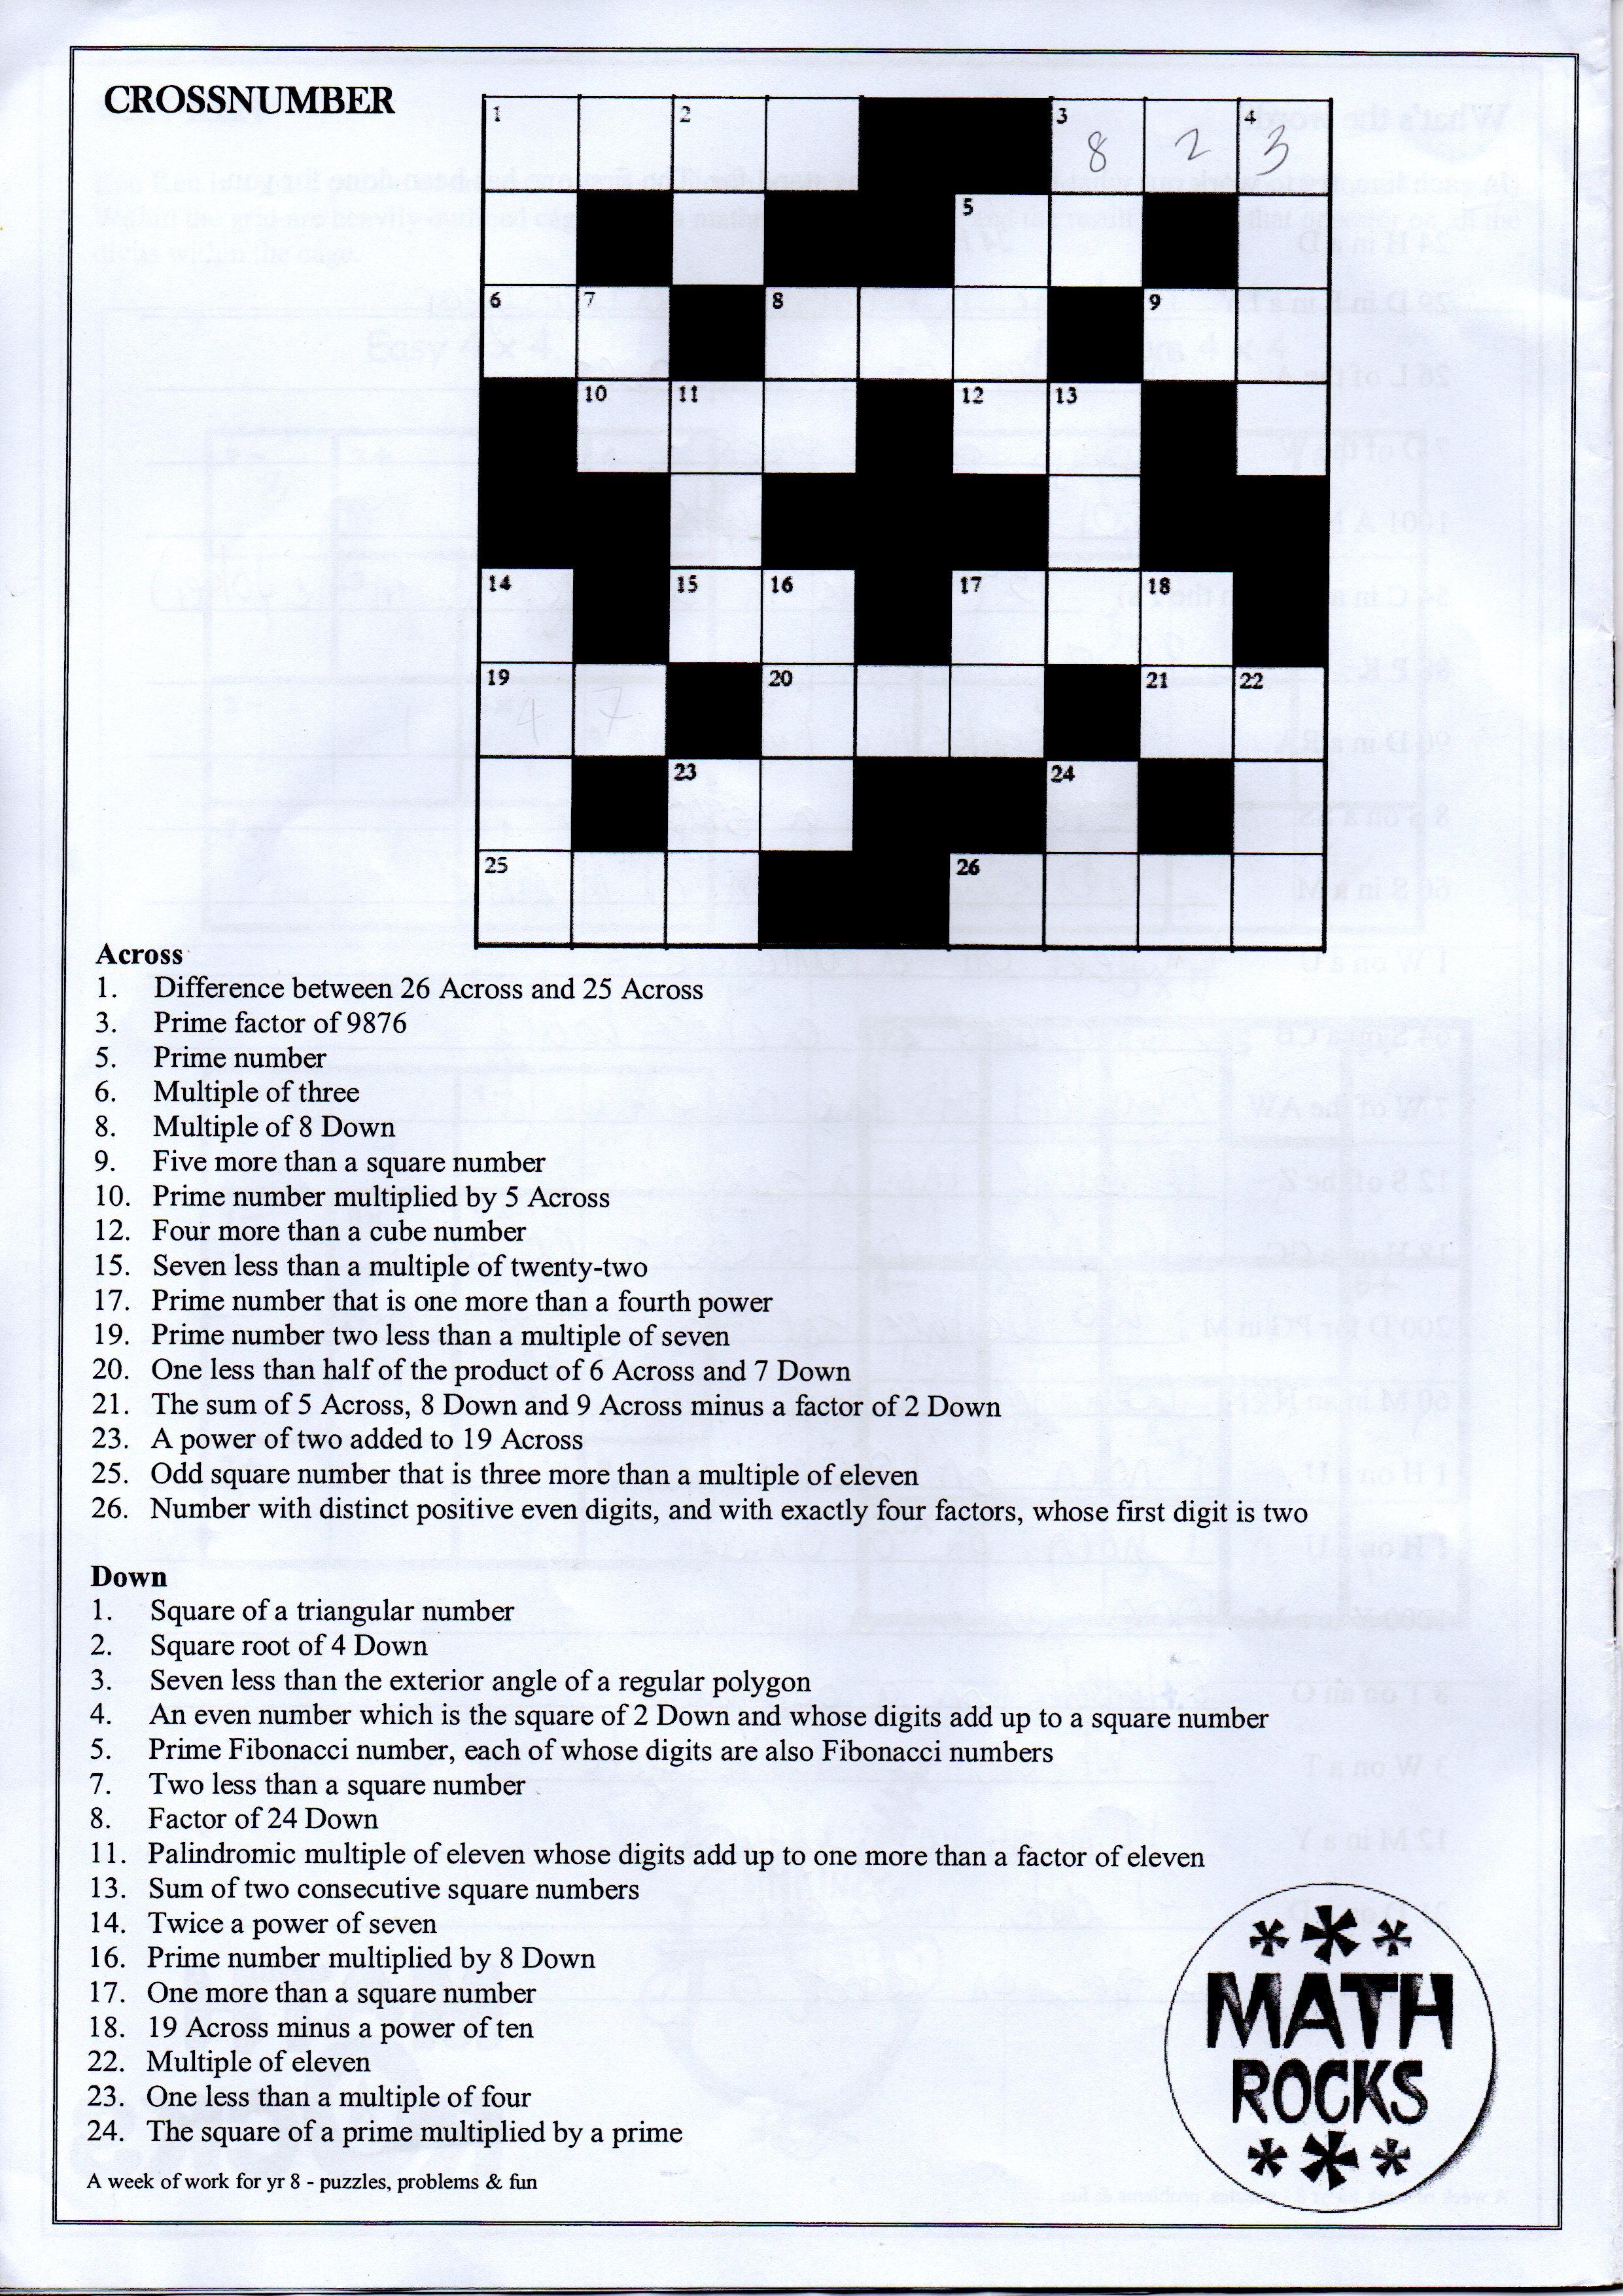 Homework Problem In Geometry Crossword